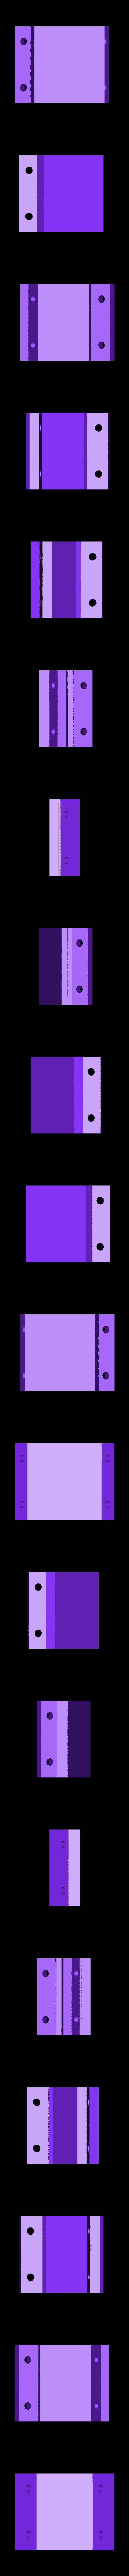 ROBO_wing_bracket.stl Download free STL file Two-wheeled Inverted Pendulum Robot • 3D printing model, whoopsie